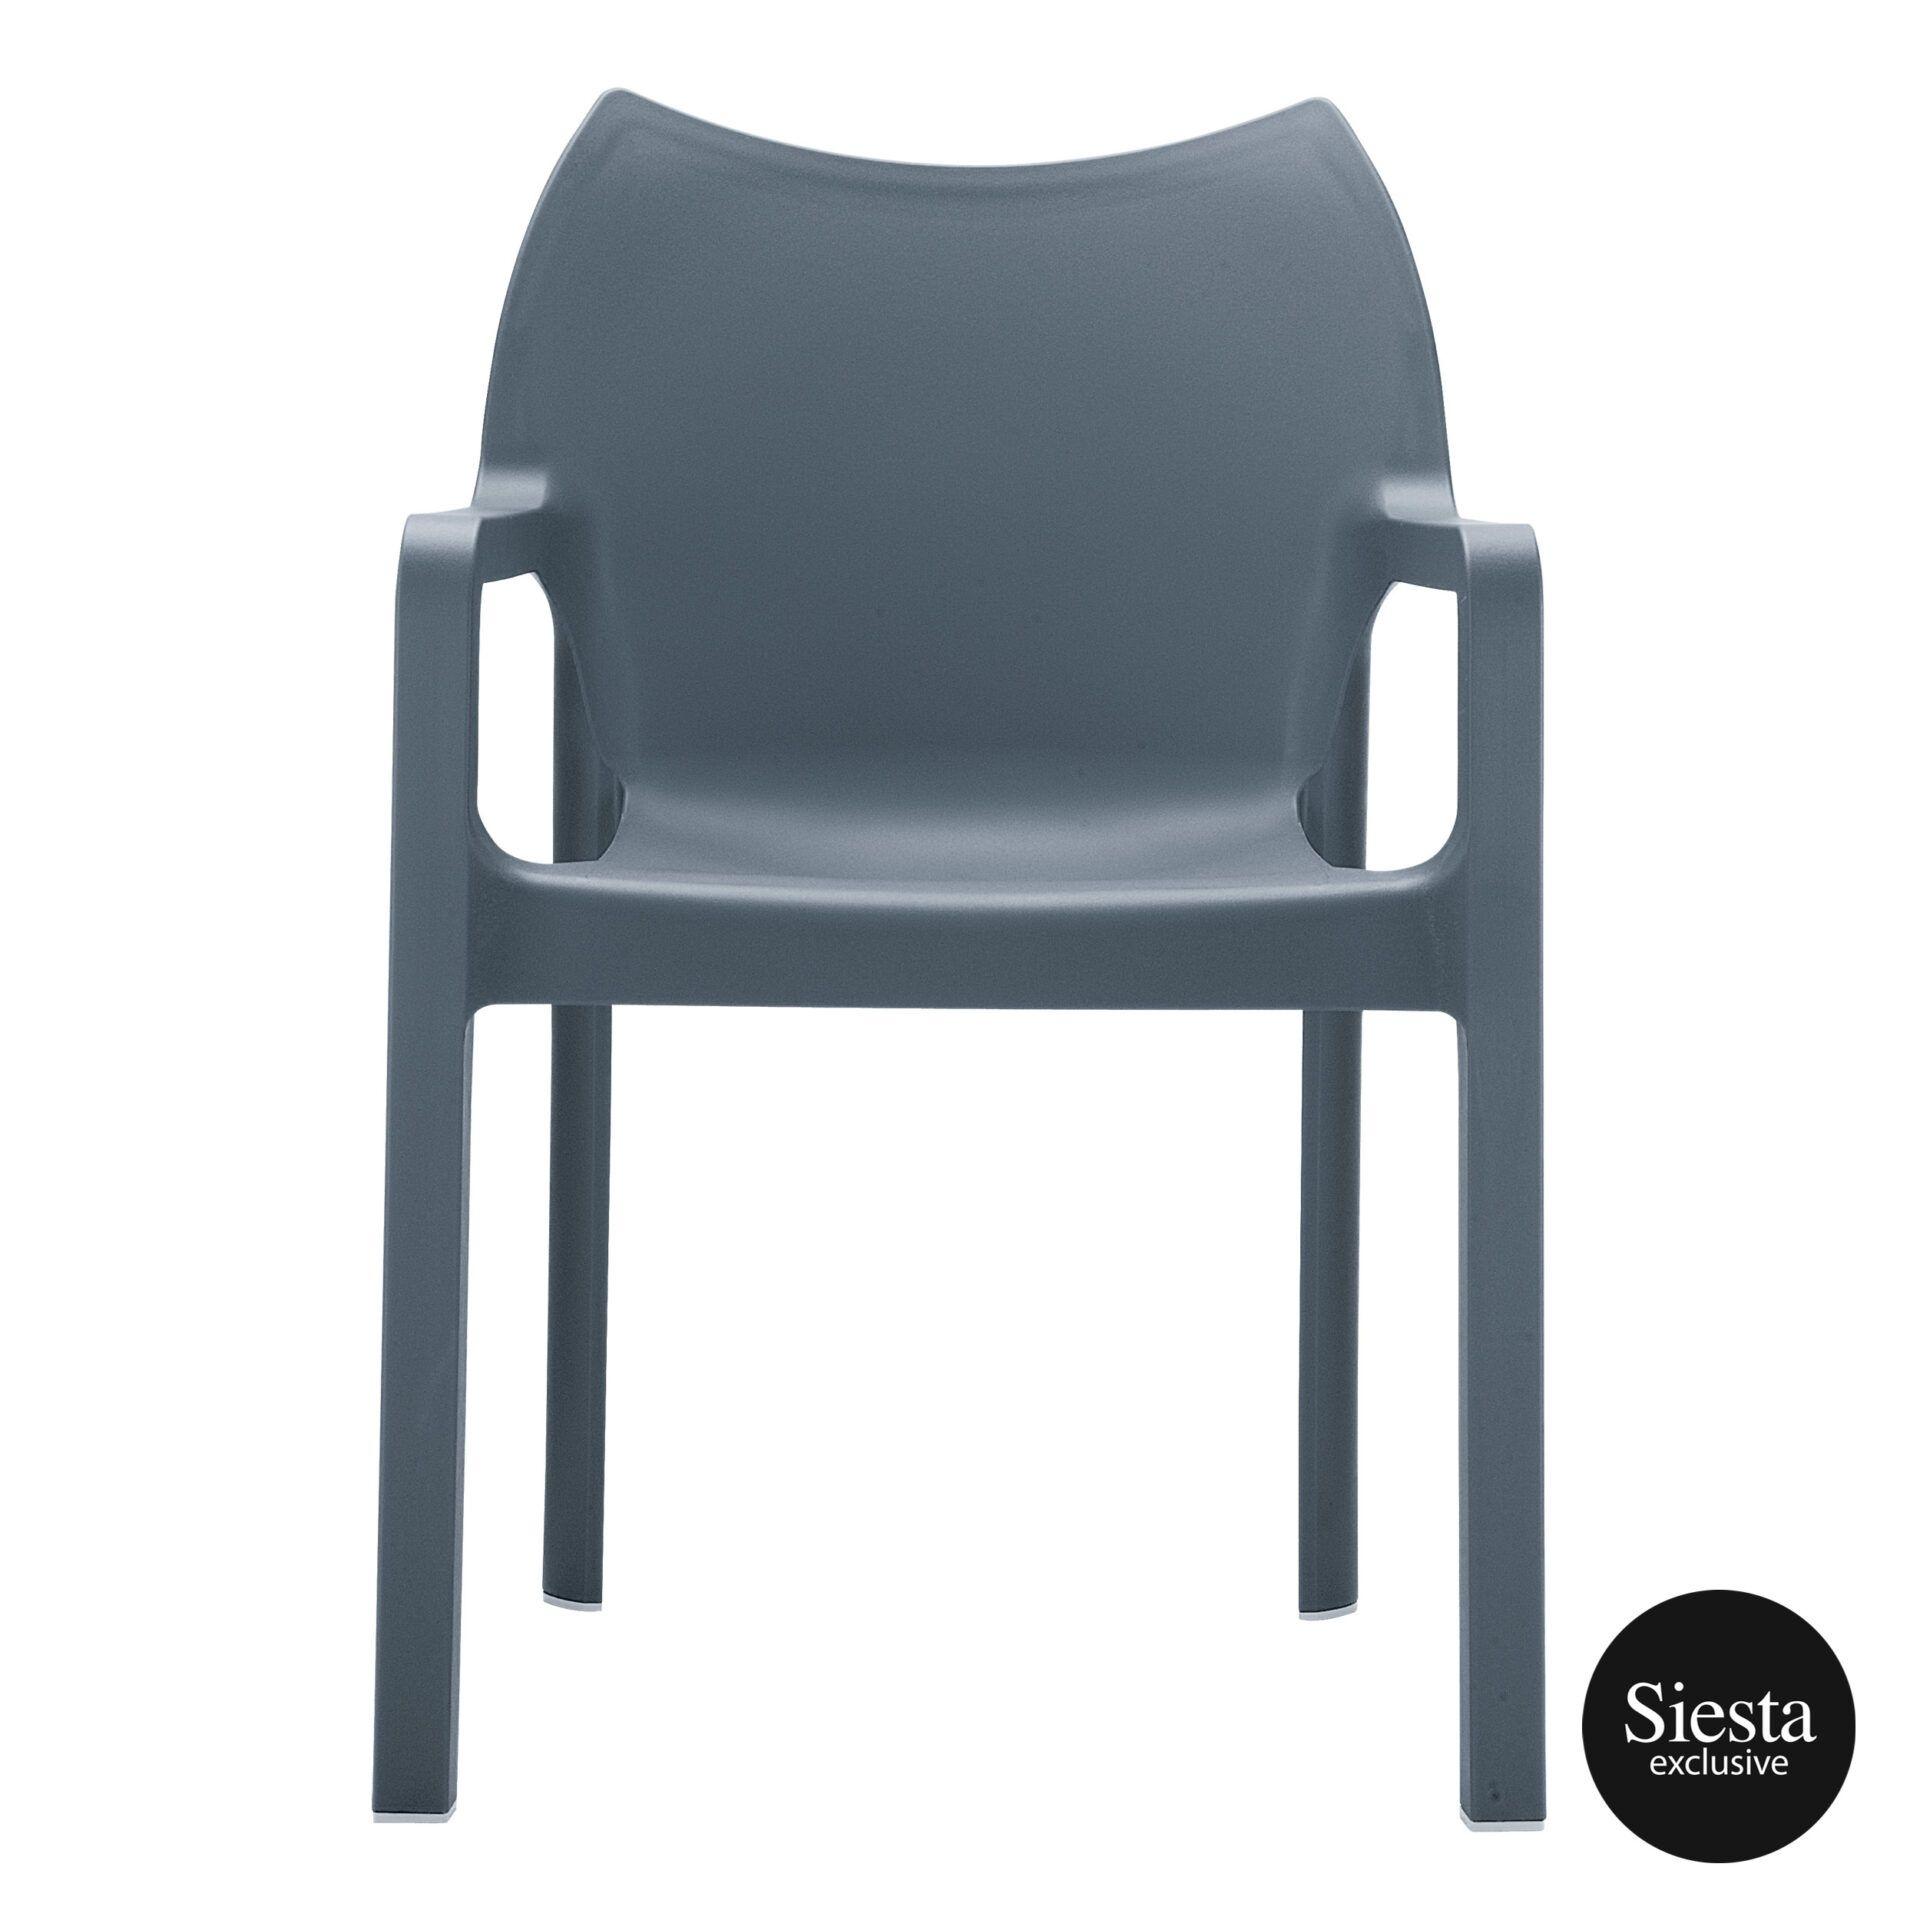 outdoor plastic seating diva chair dark grey front 1